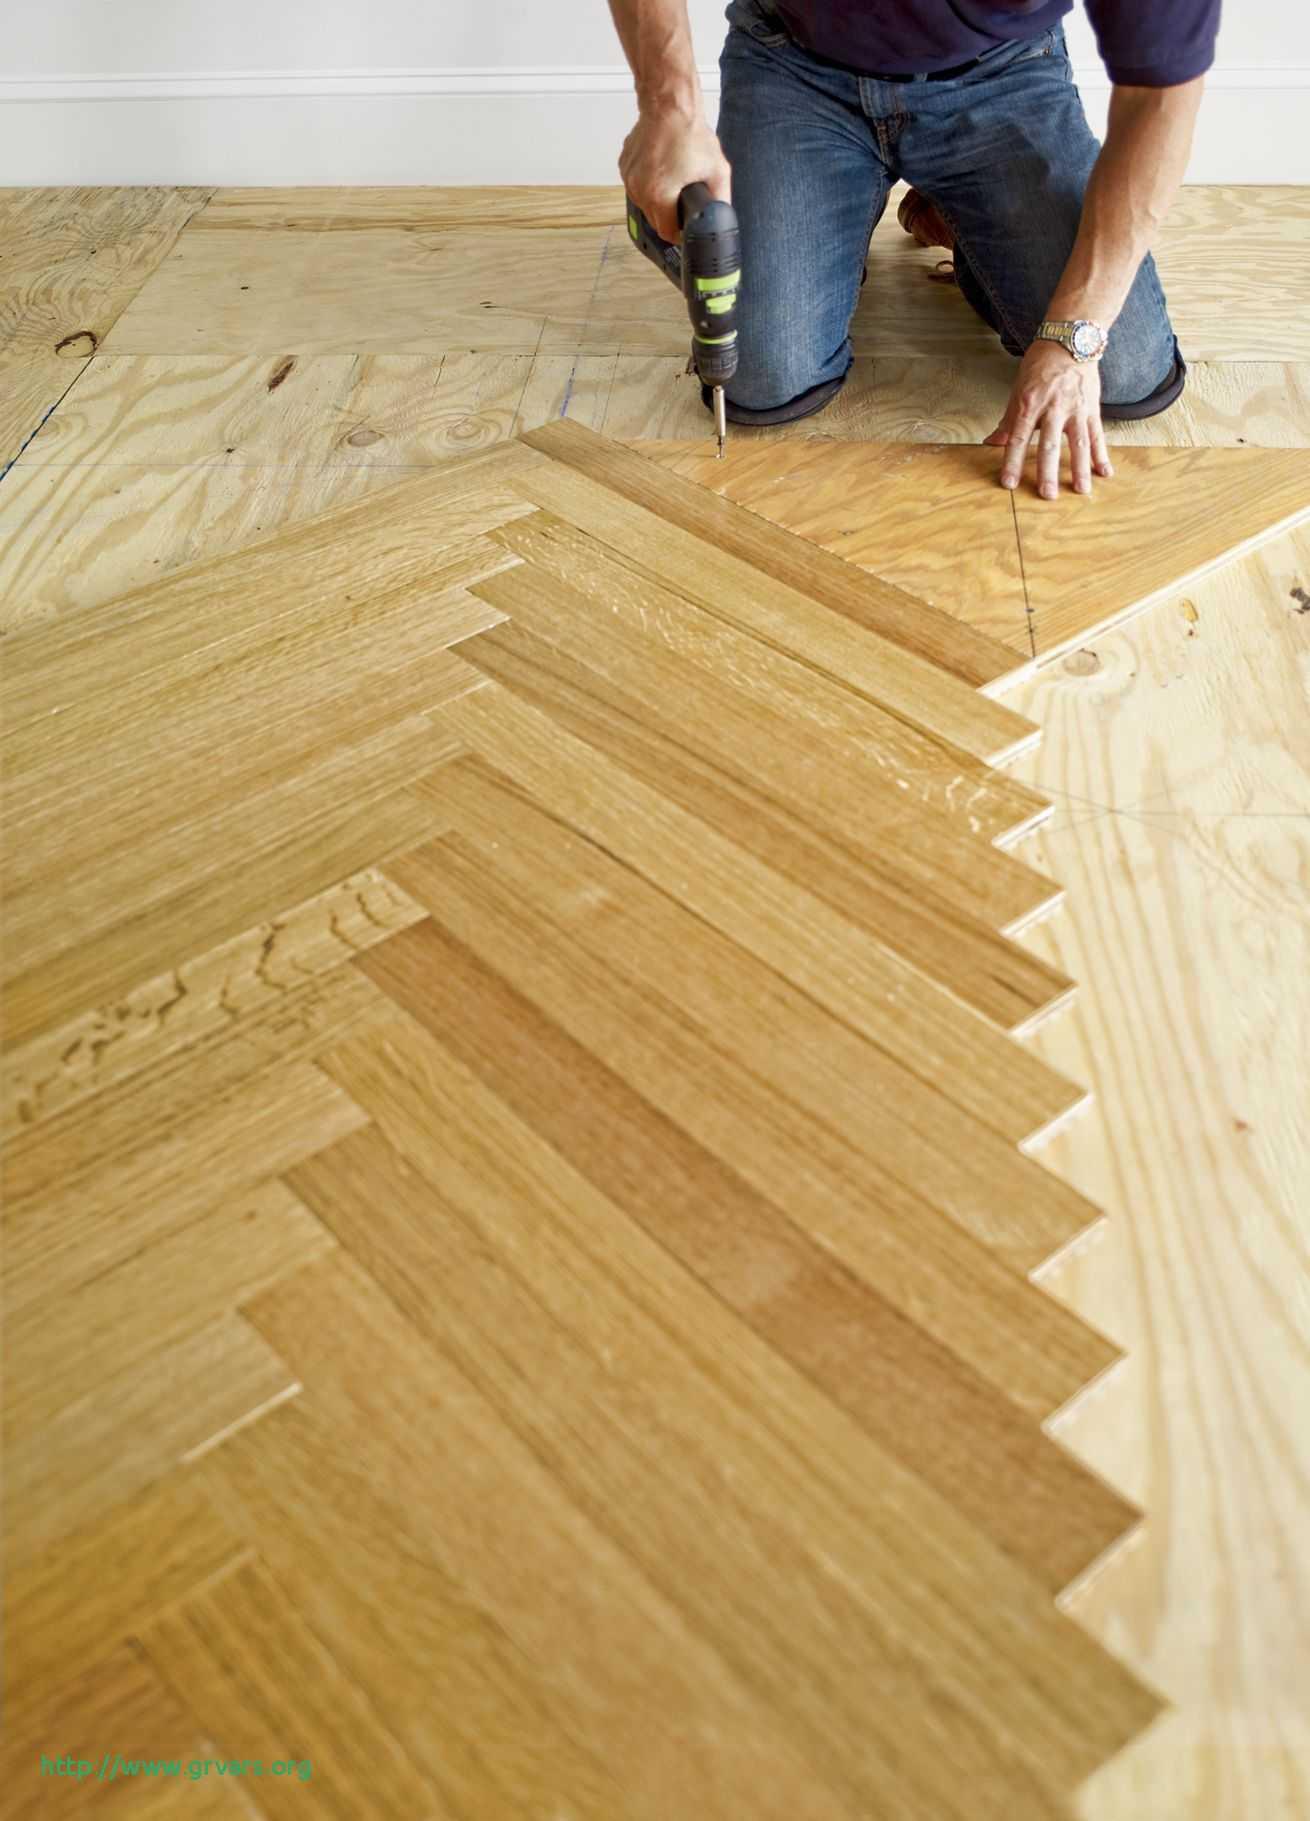 12 Amazing Laying Tongue And Groove Hardwood Floors Unique